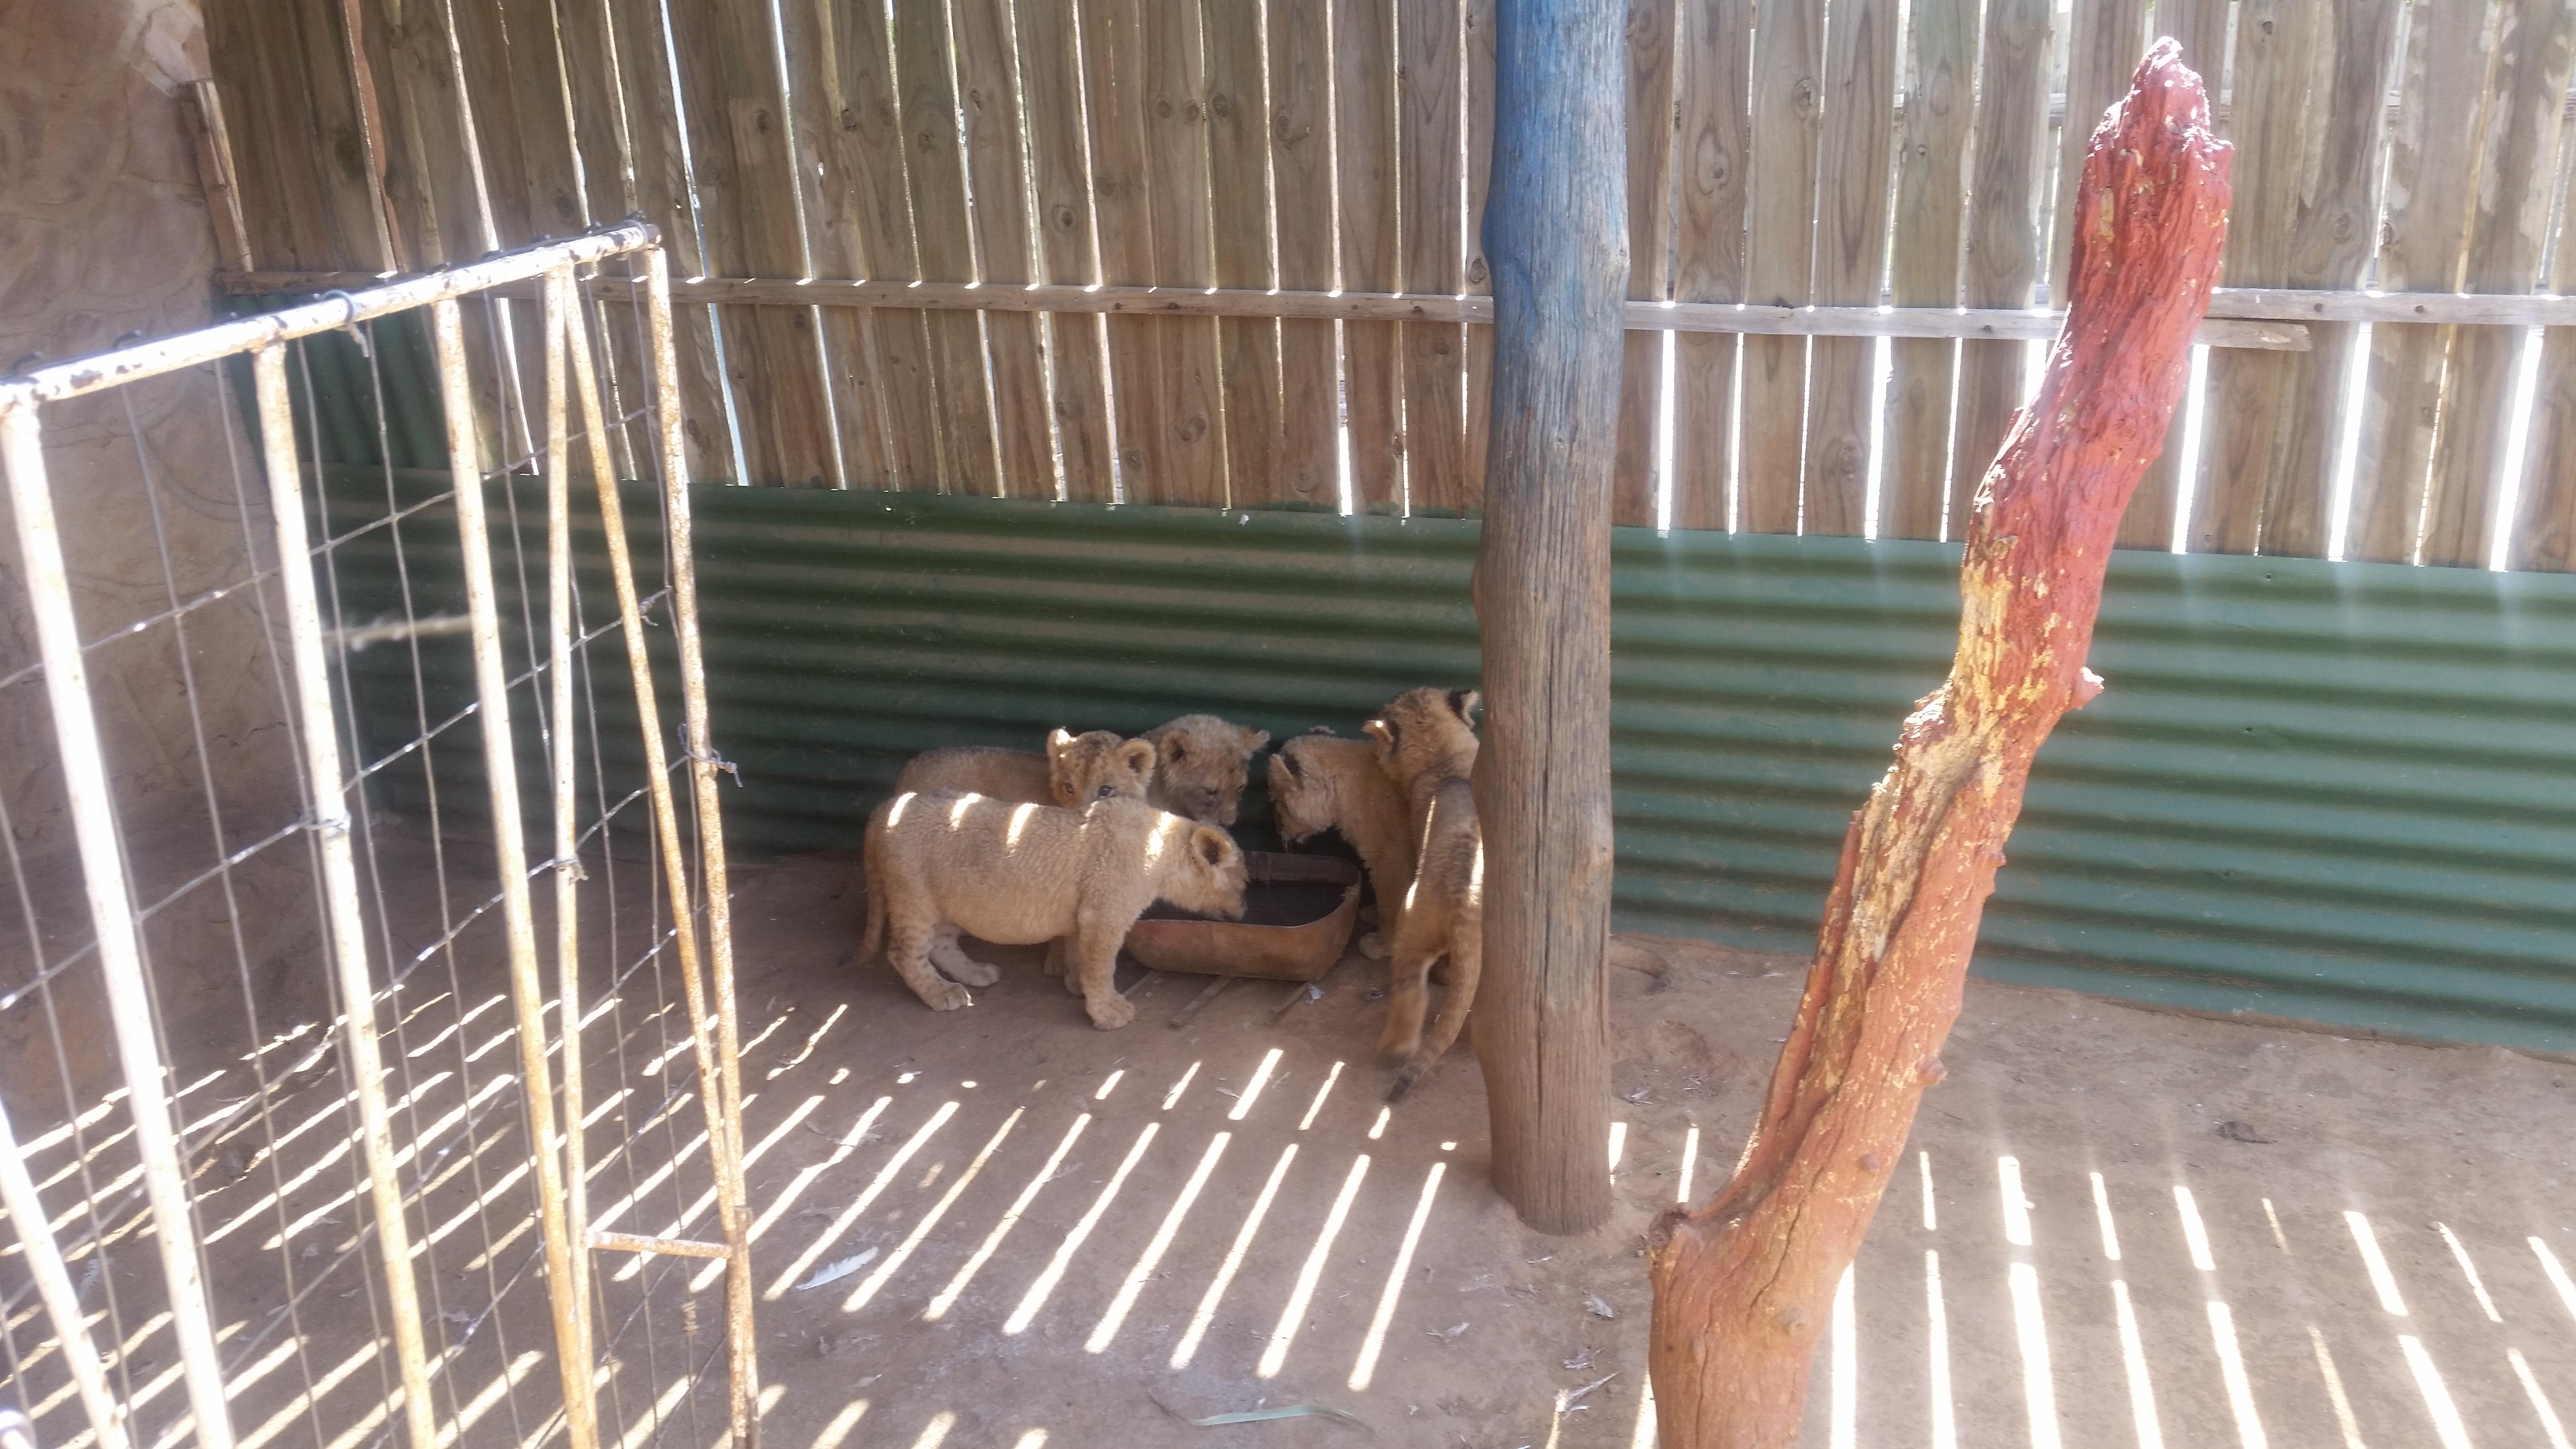 Captive-bred lions